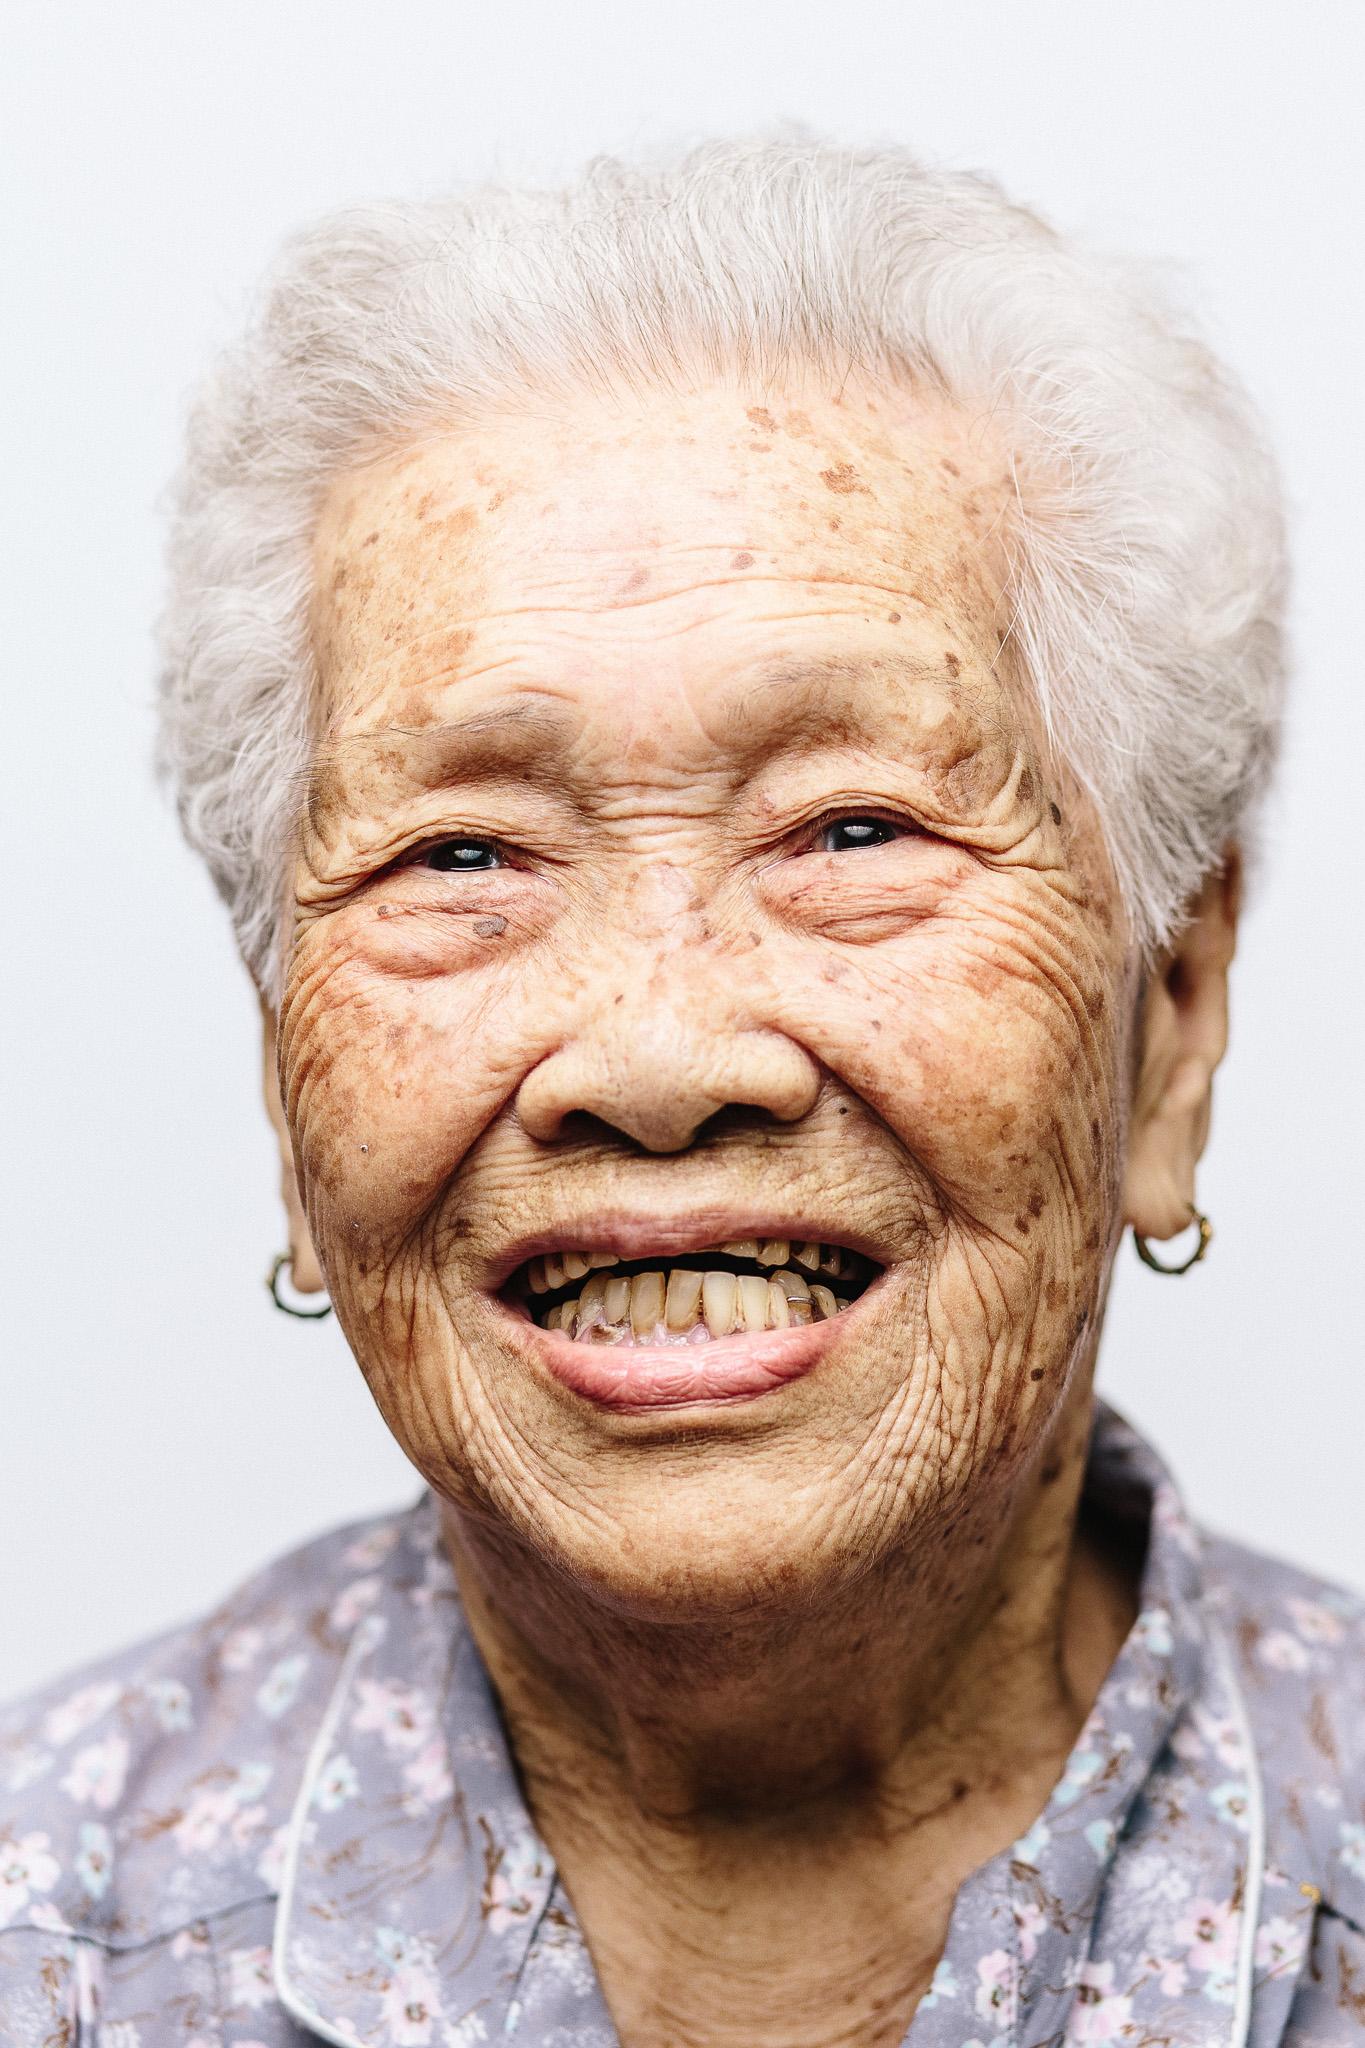 zainal-zainal-studio-centenarians-care-duke-nus-singapore-photographer-03.jpg